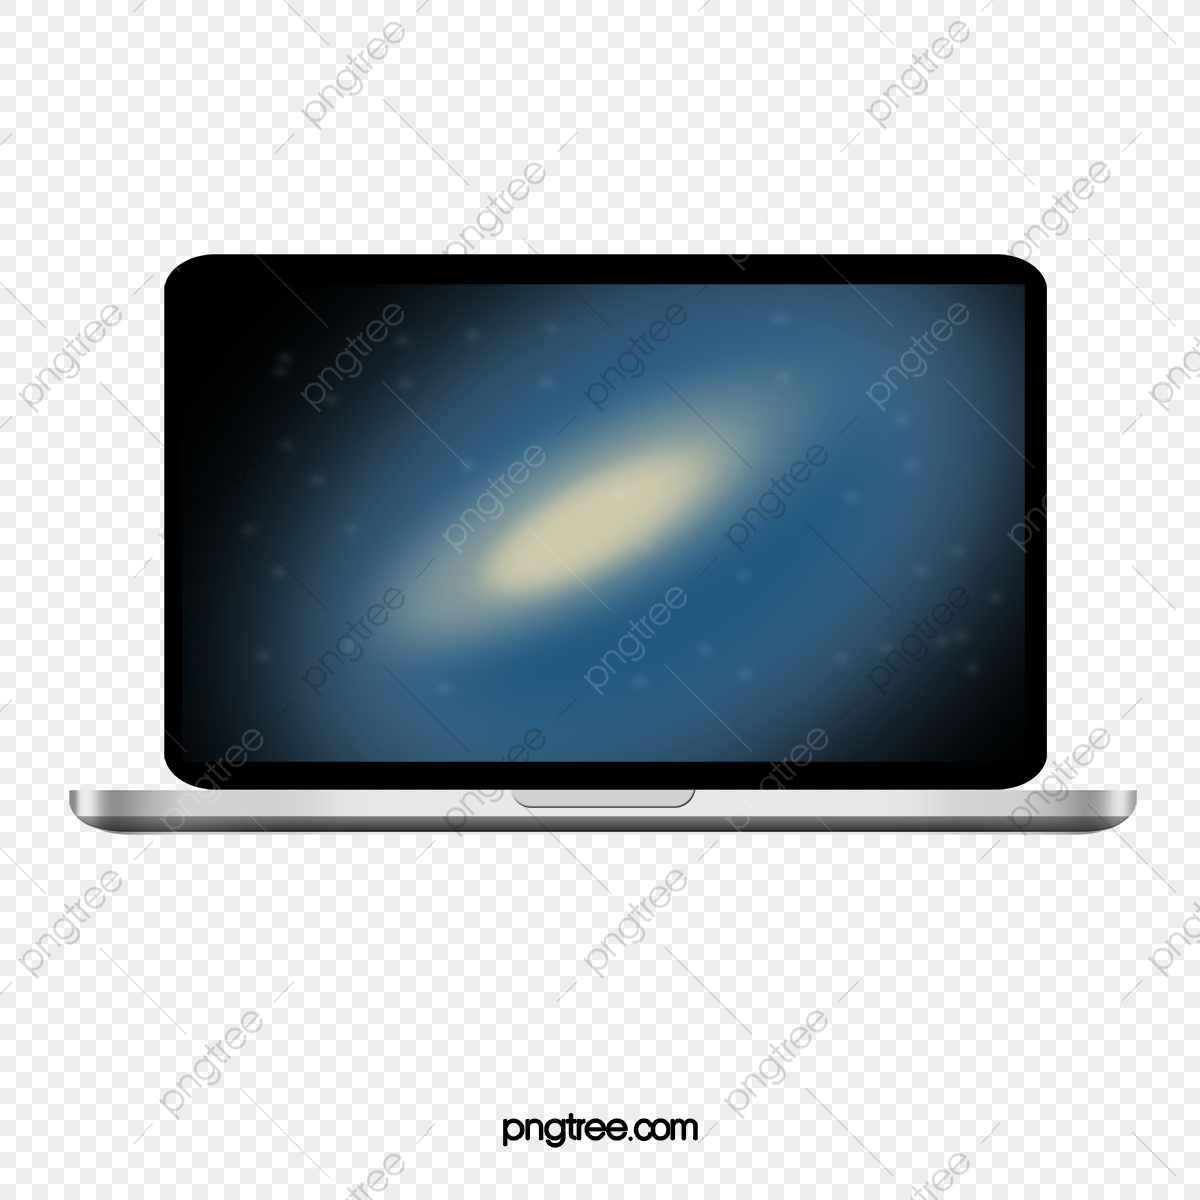 Apple Laptop Modern Technology, Laptop Clipart, Product Kind, Apple.